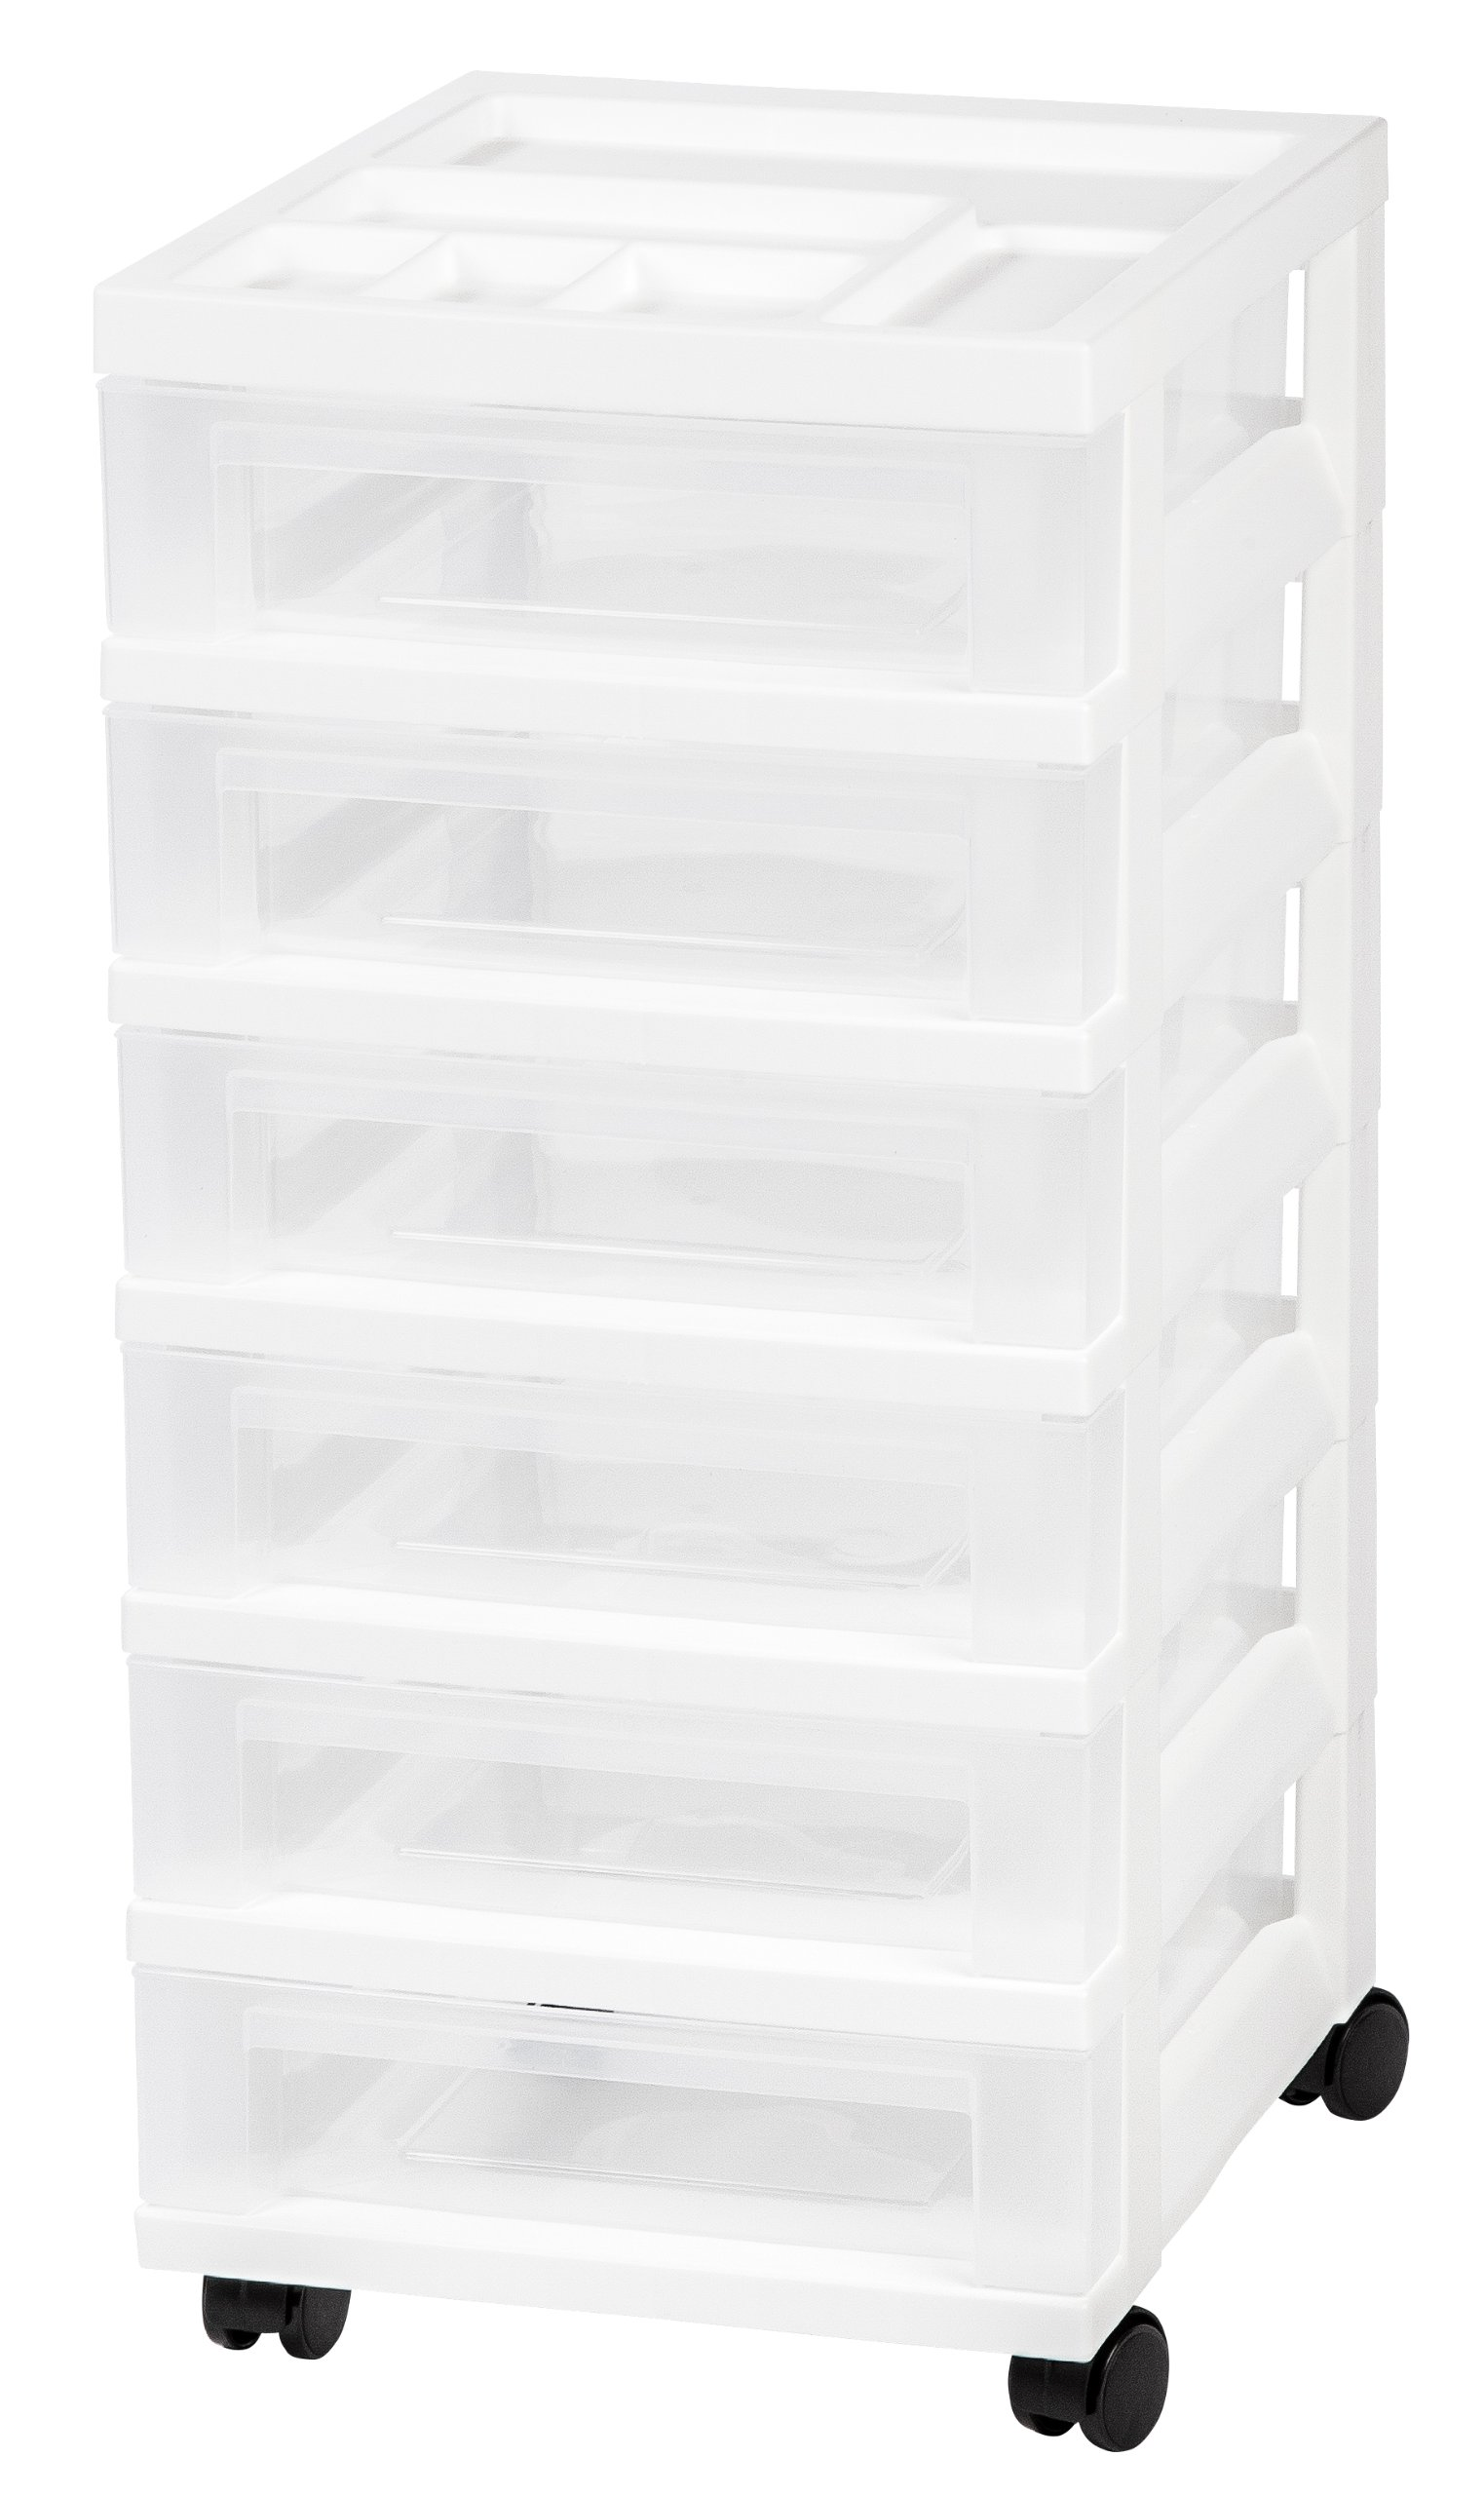 IRIS 6-Drawer Rolling Storage Cart with Organizer Top, White by IRIS USA, Inc.